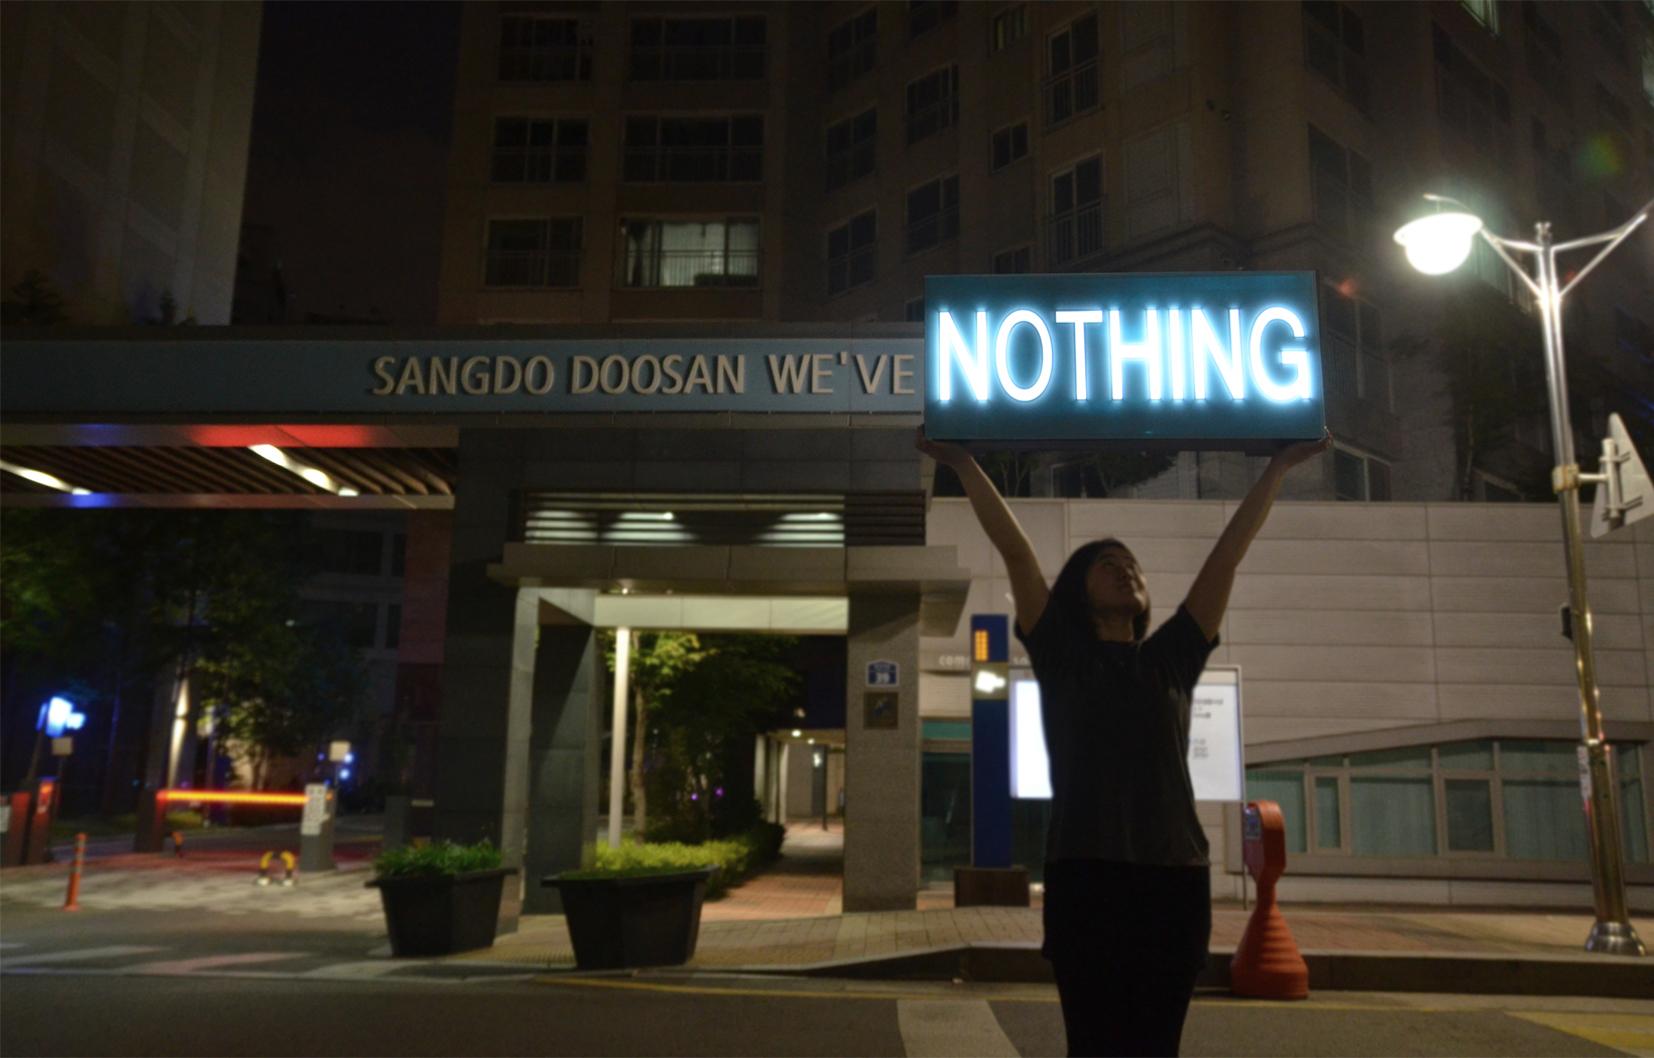 We've Nothing